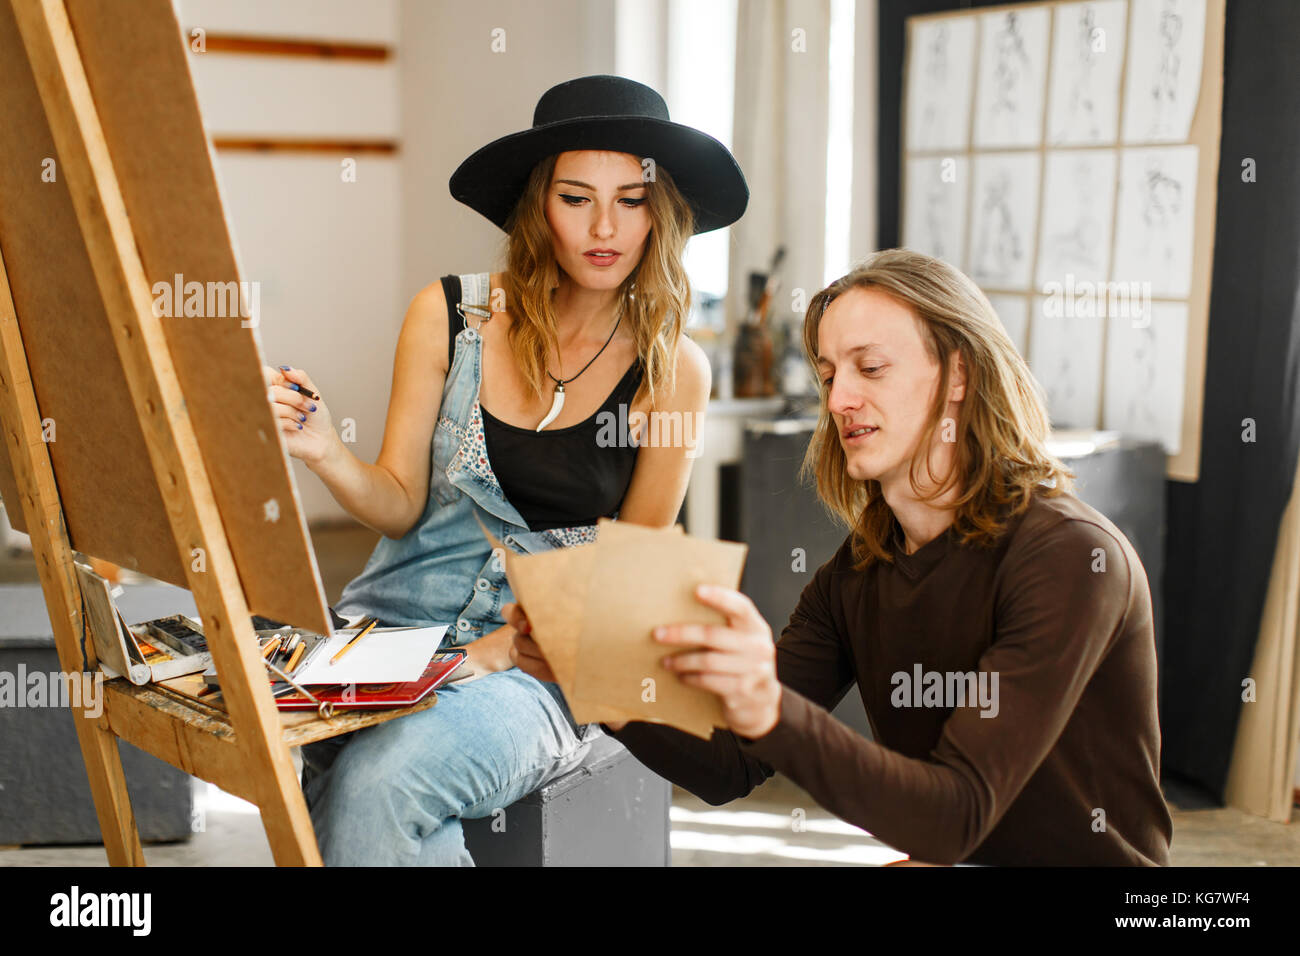 Artiste consulter son collègue pendant le dessin Photo Stock